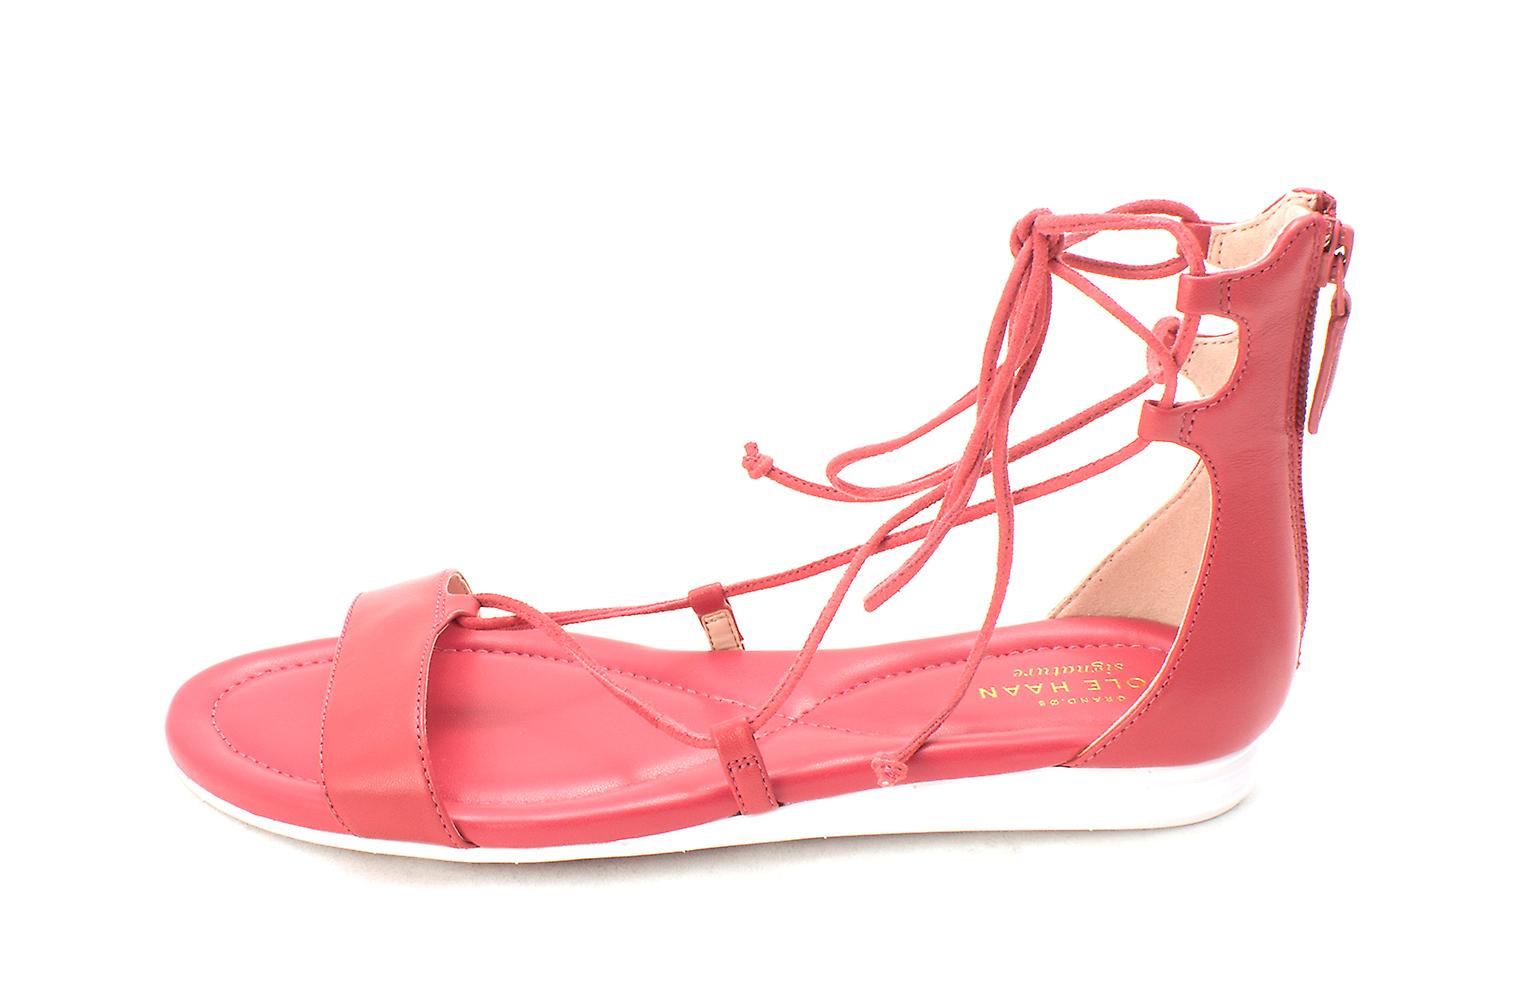 Cole Haan Womens Original grand LCSDII Open Toe Casual Slide Sandals